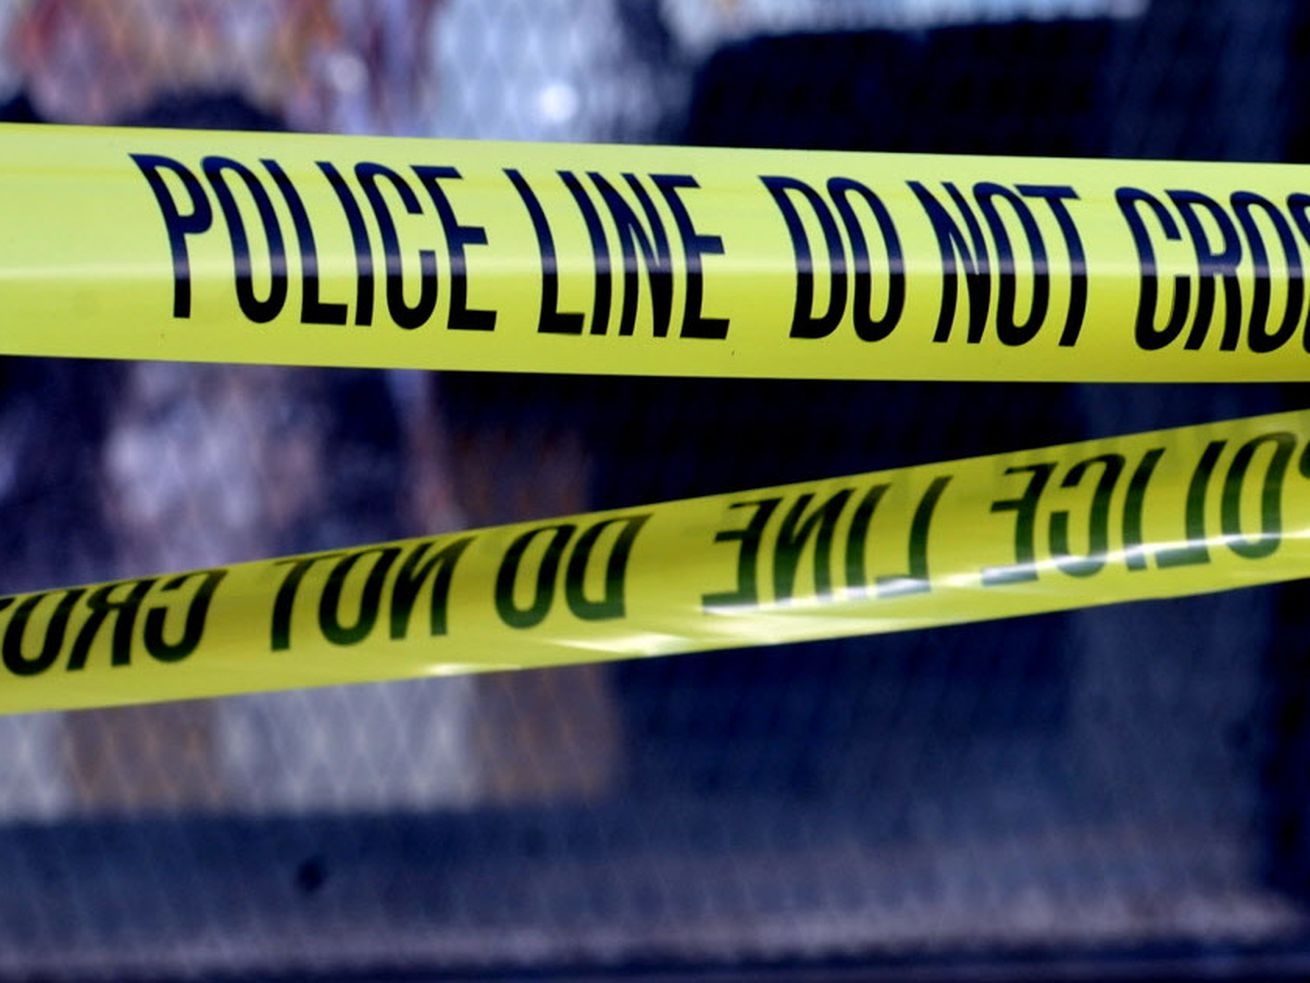 A man was fatally shot Sept. 8, 2021, in West Garfield Park.